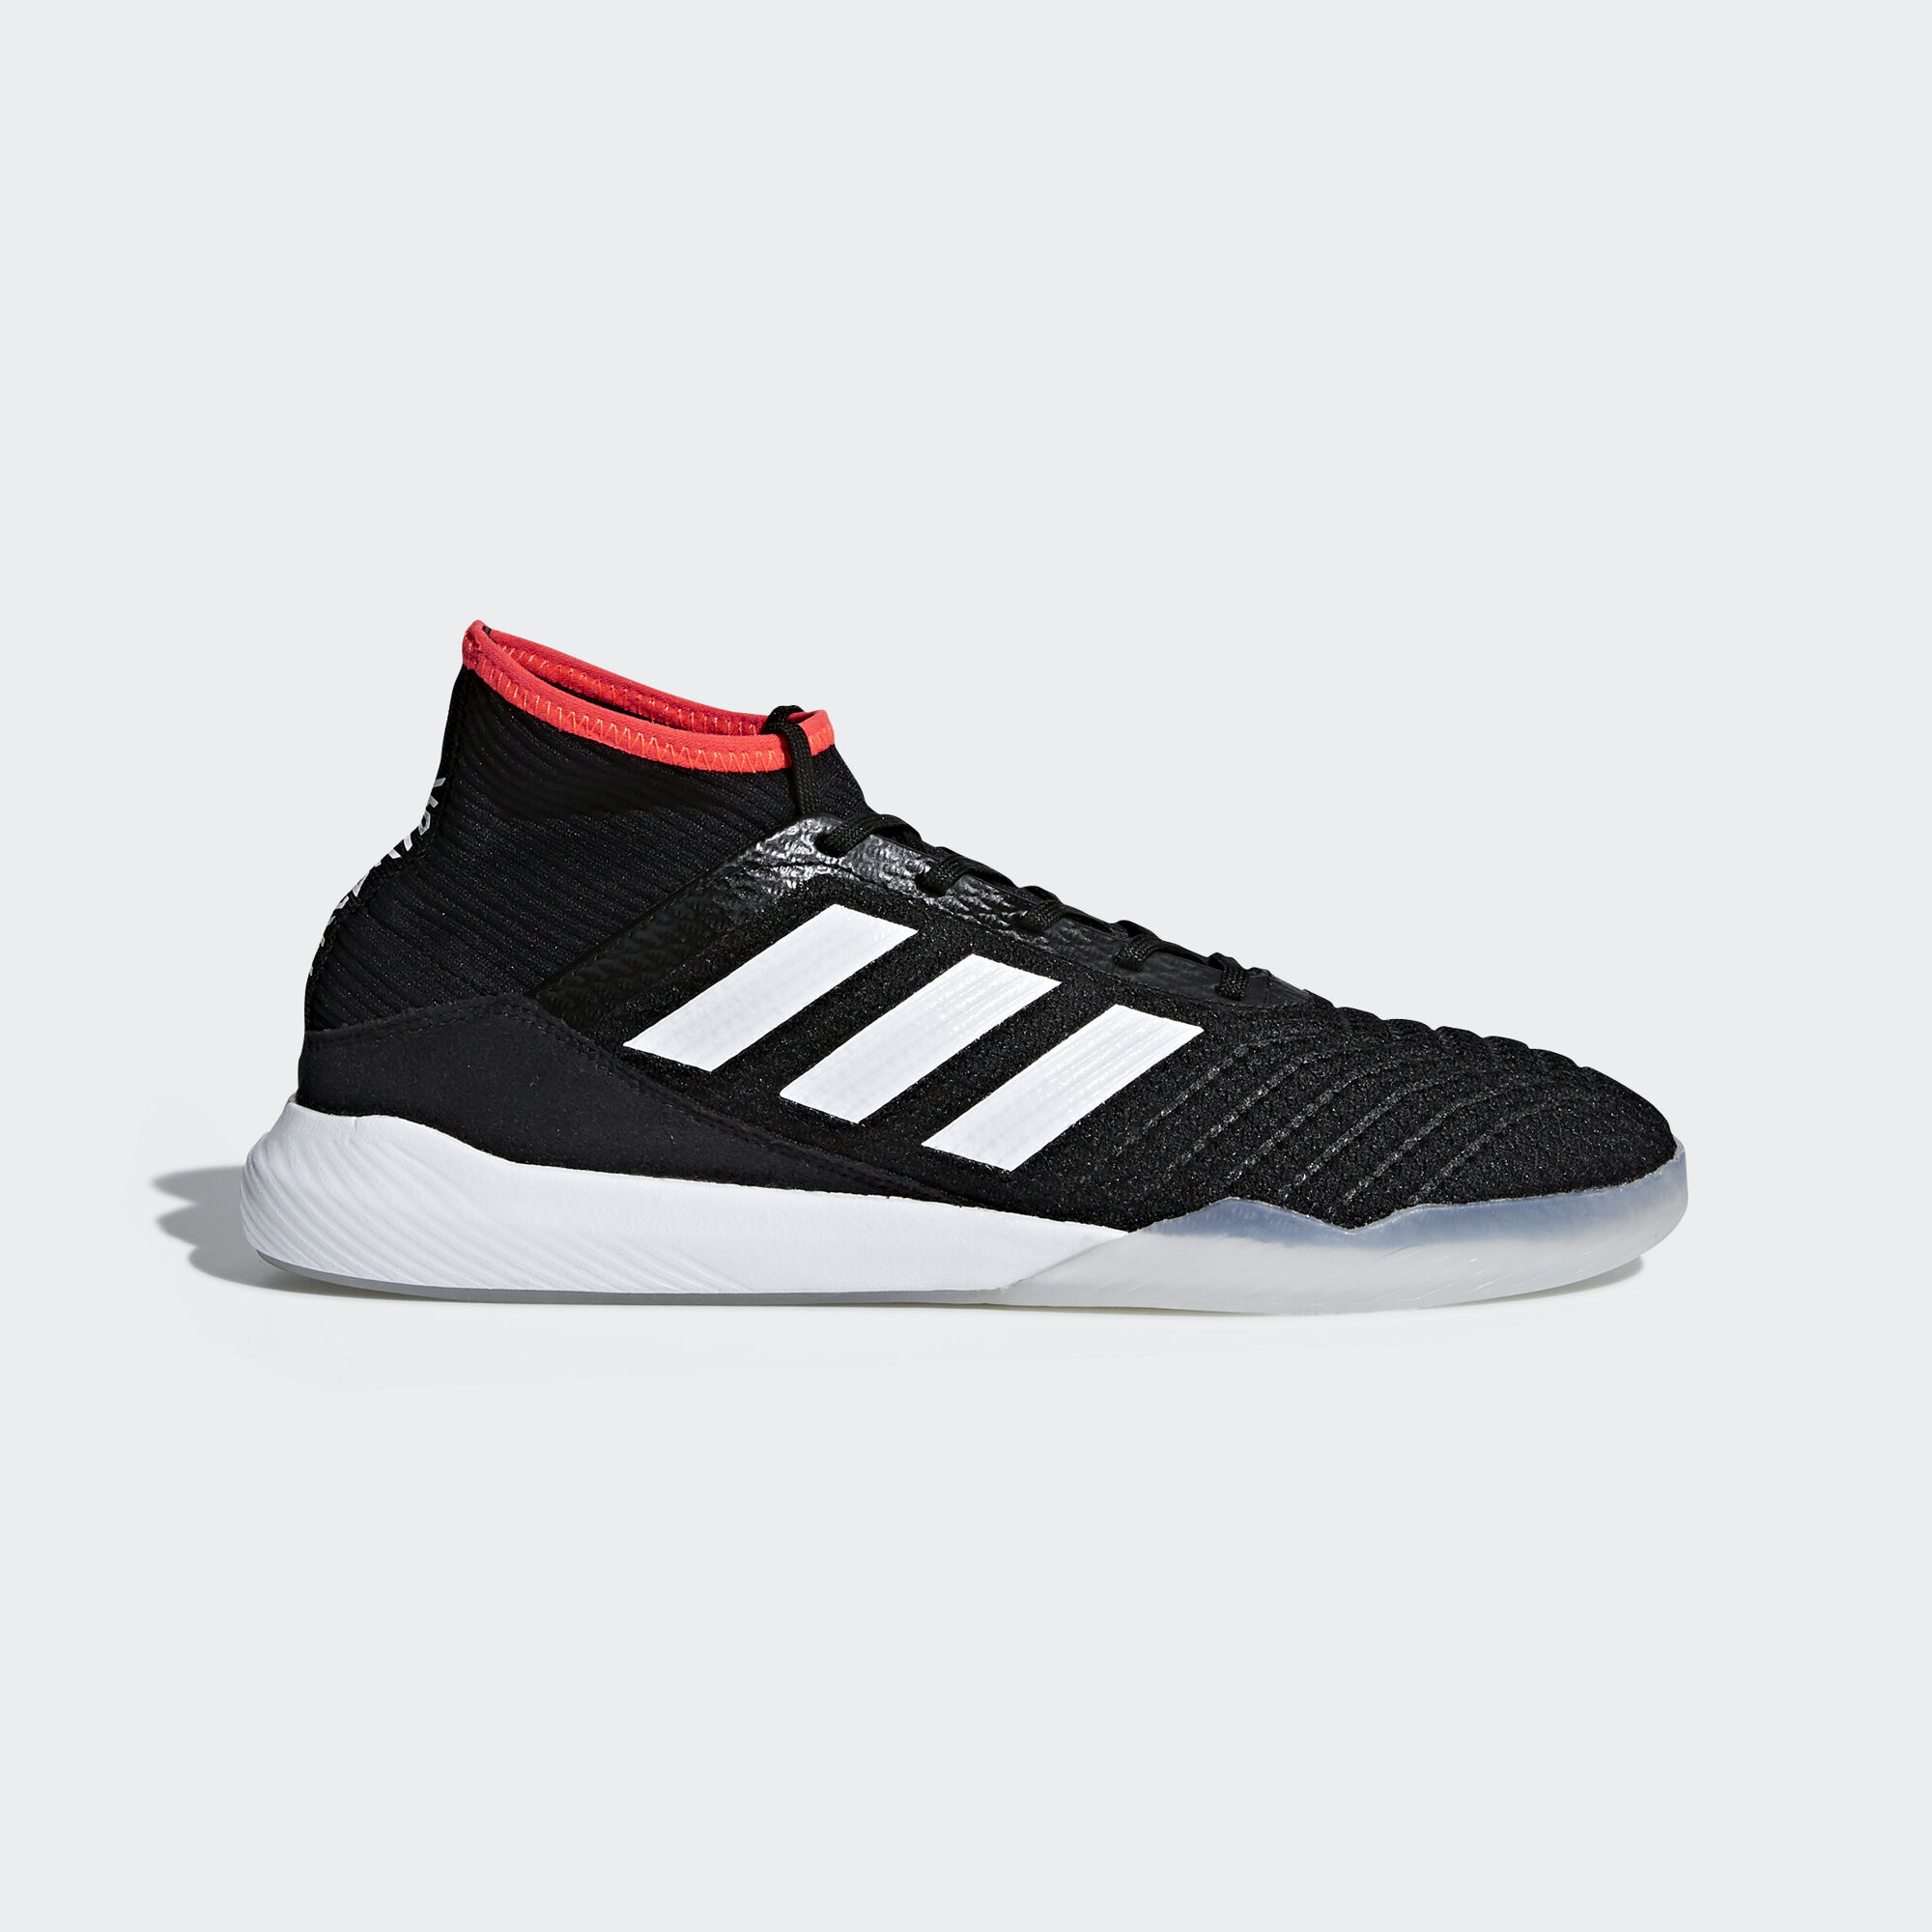 Football Tango Predator 18.3 Trainers In Black CP9297 - Black adidas zju781